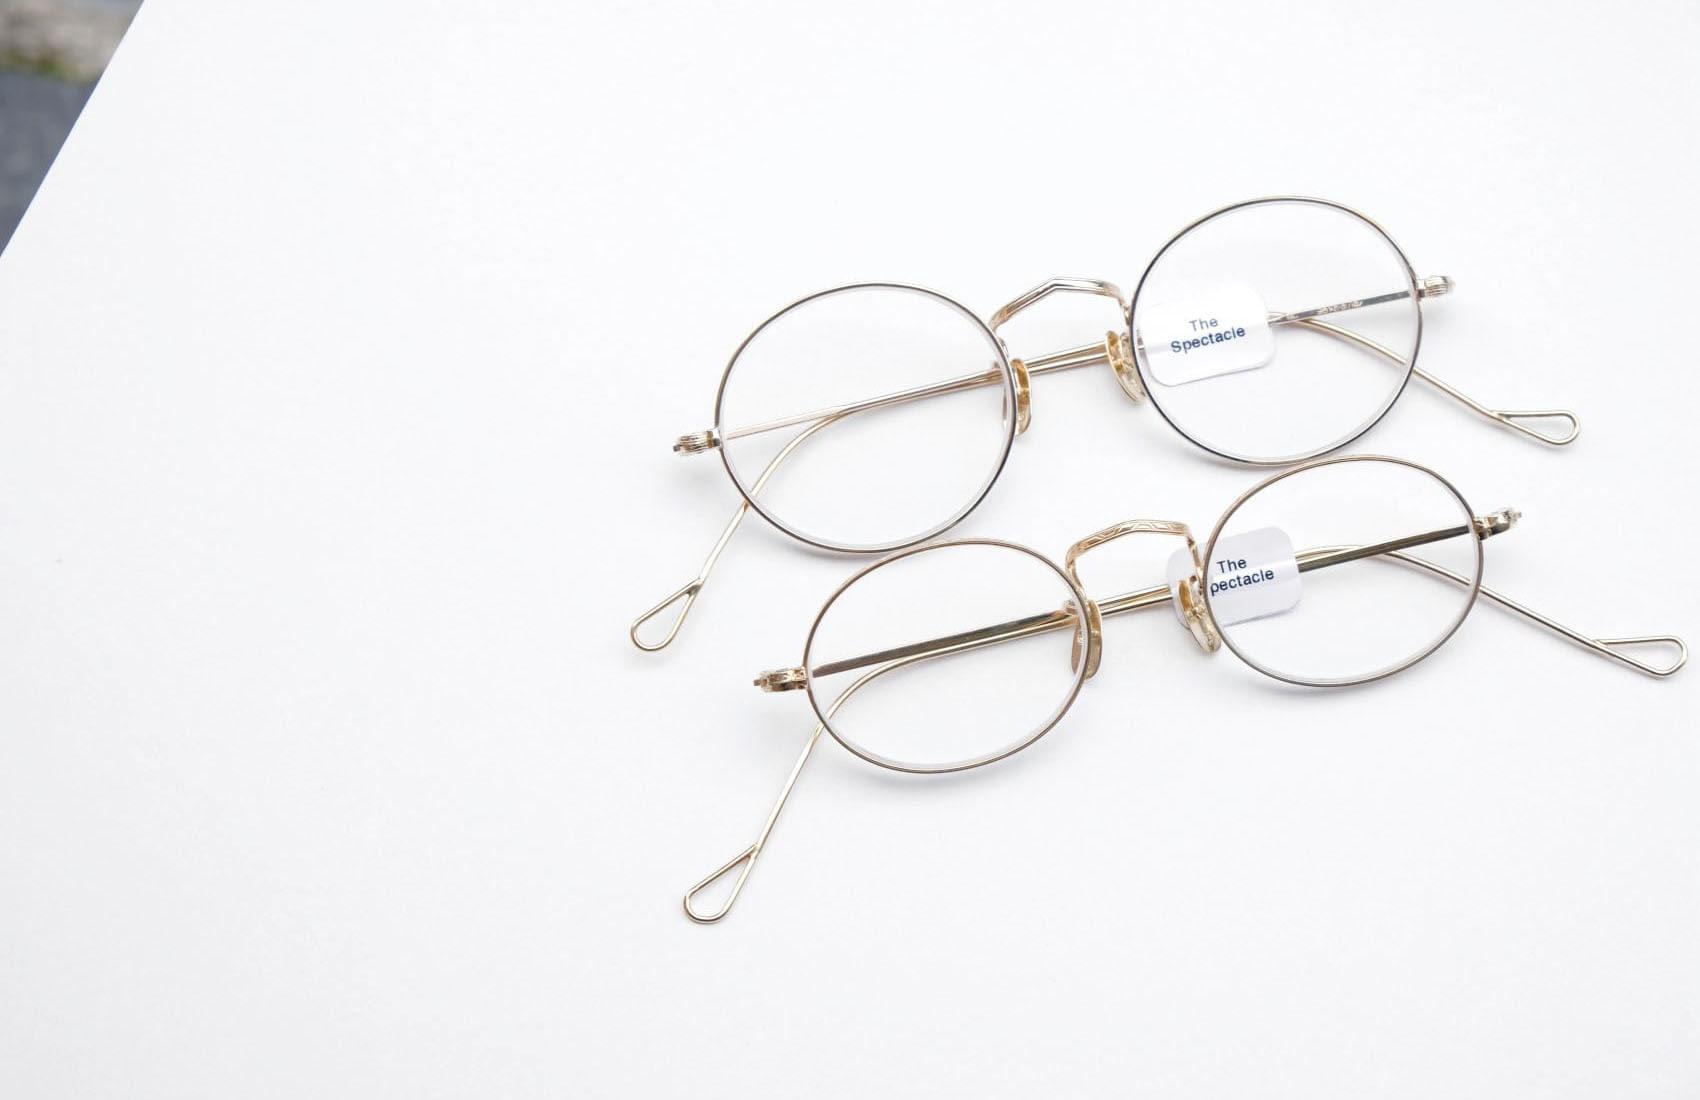 The Spectacle(RetroSpecs & Co.) Metal